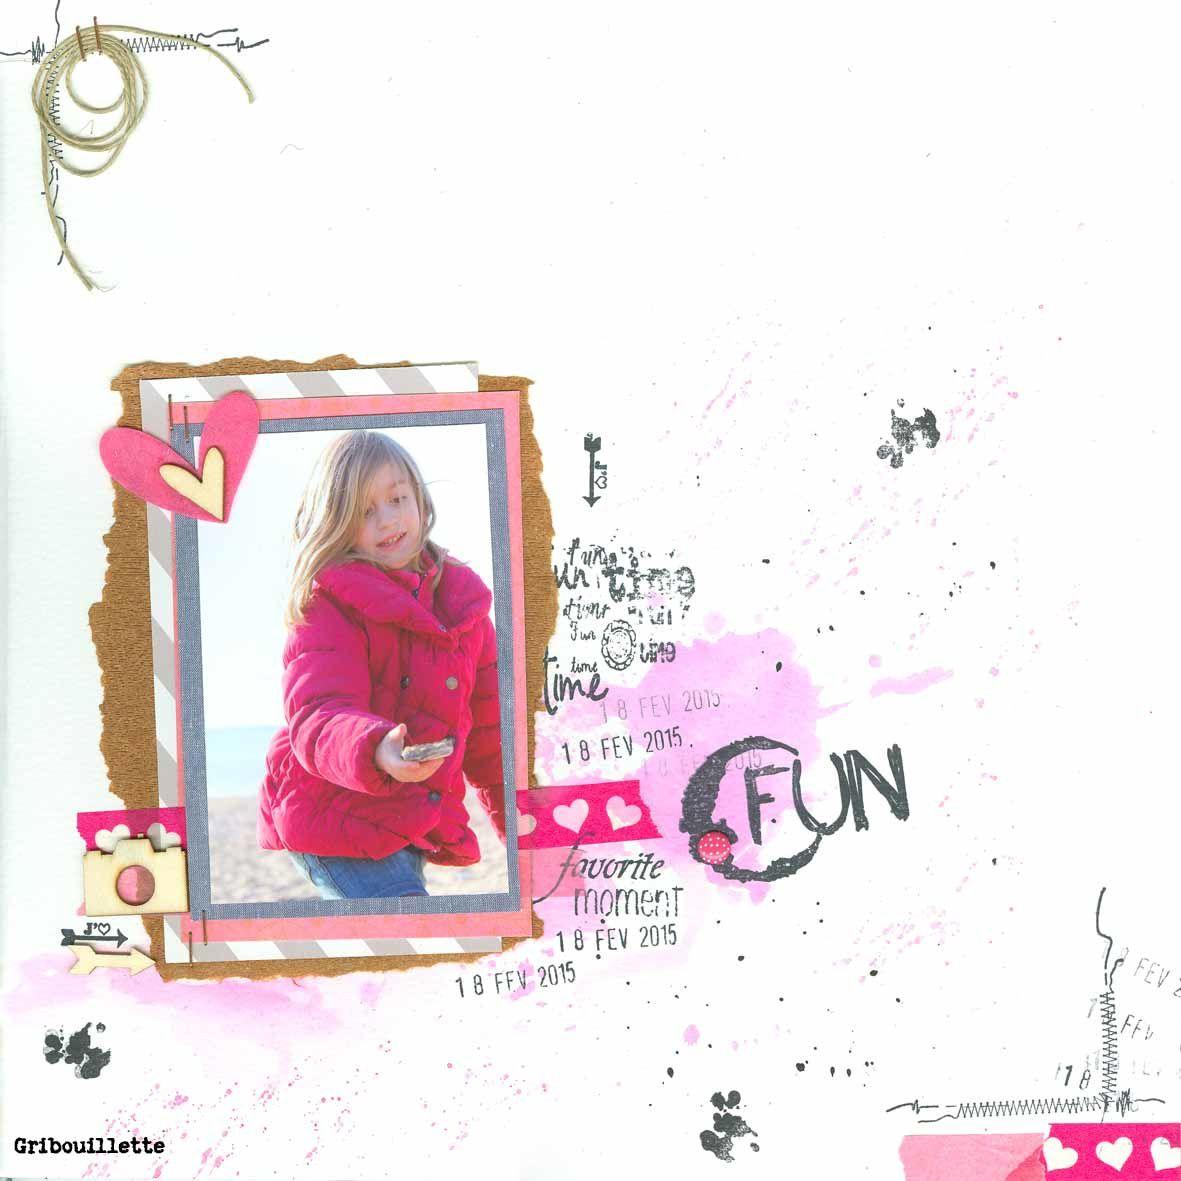 Fun_Challenge mensuel de l'AntreScrap